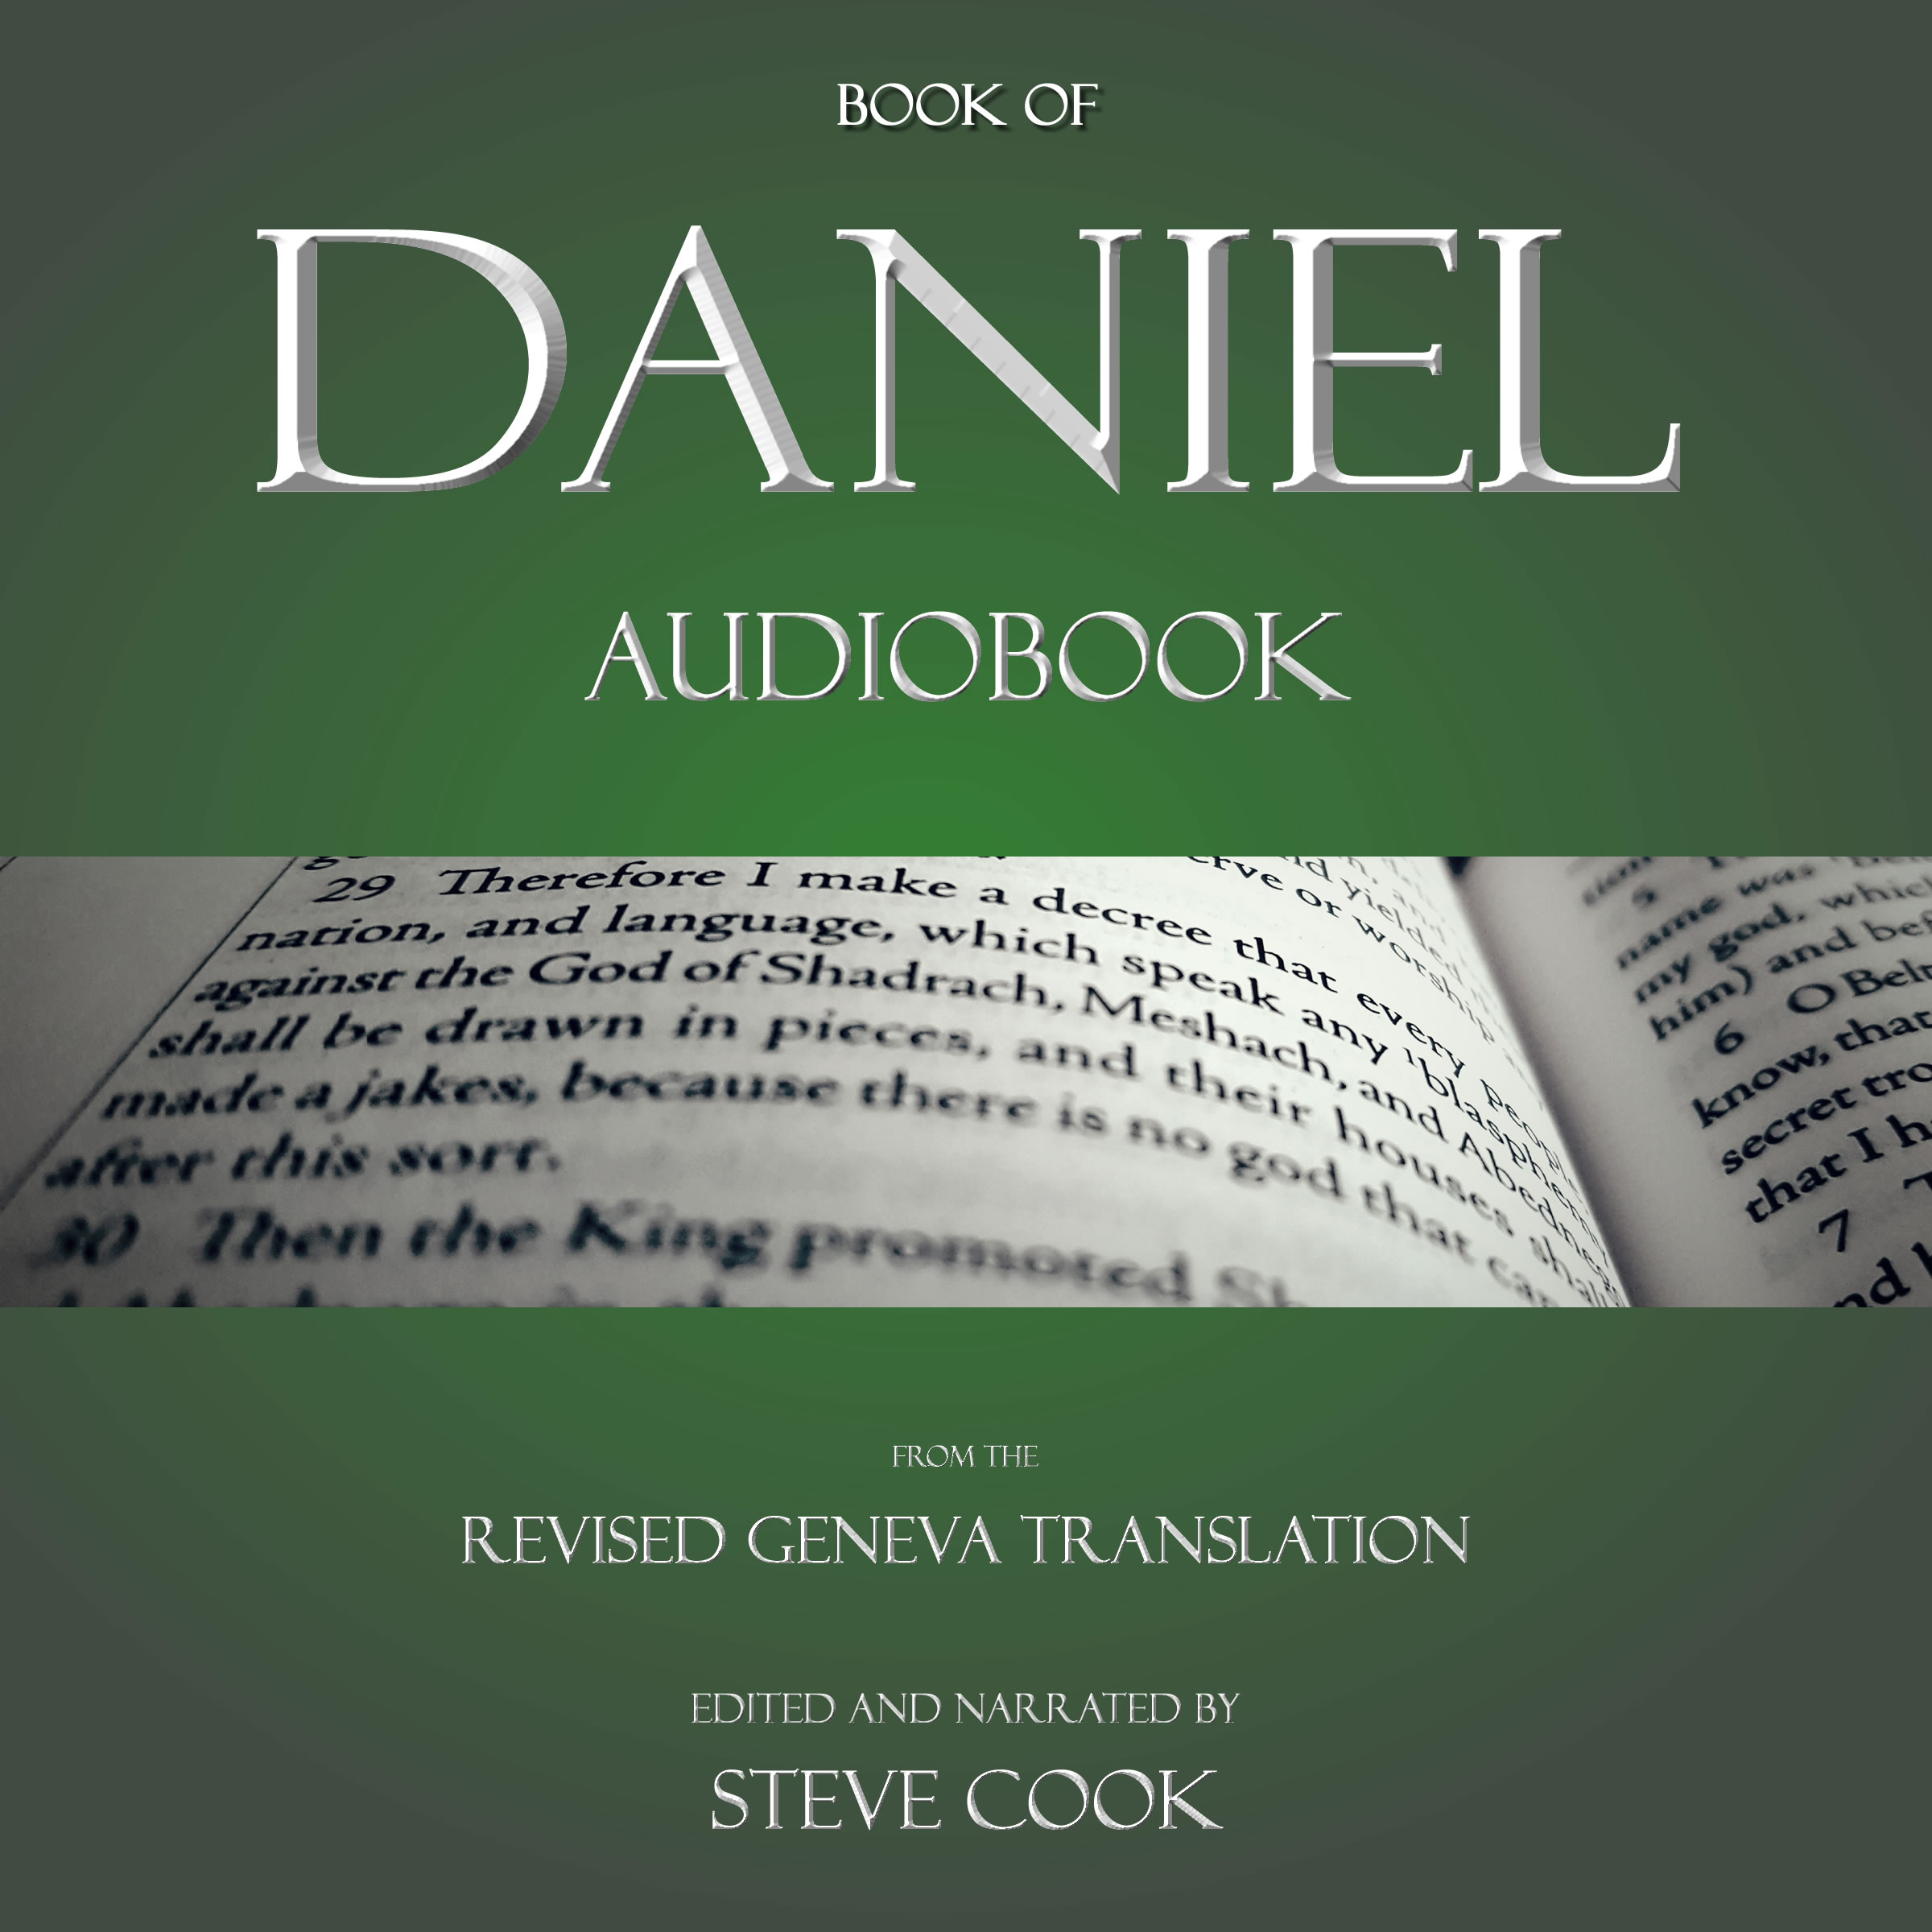 RGT_DANIEL_Cover.jpg